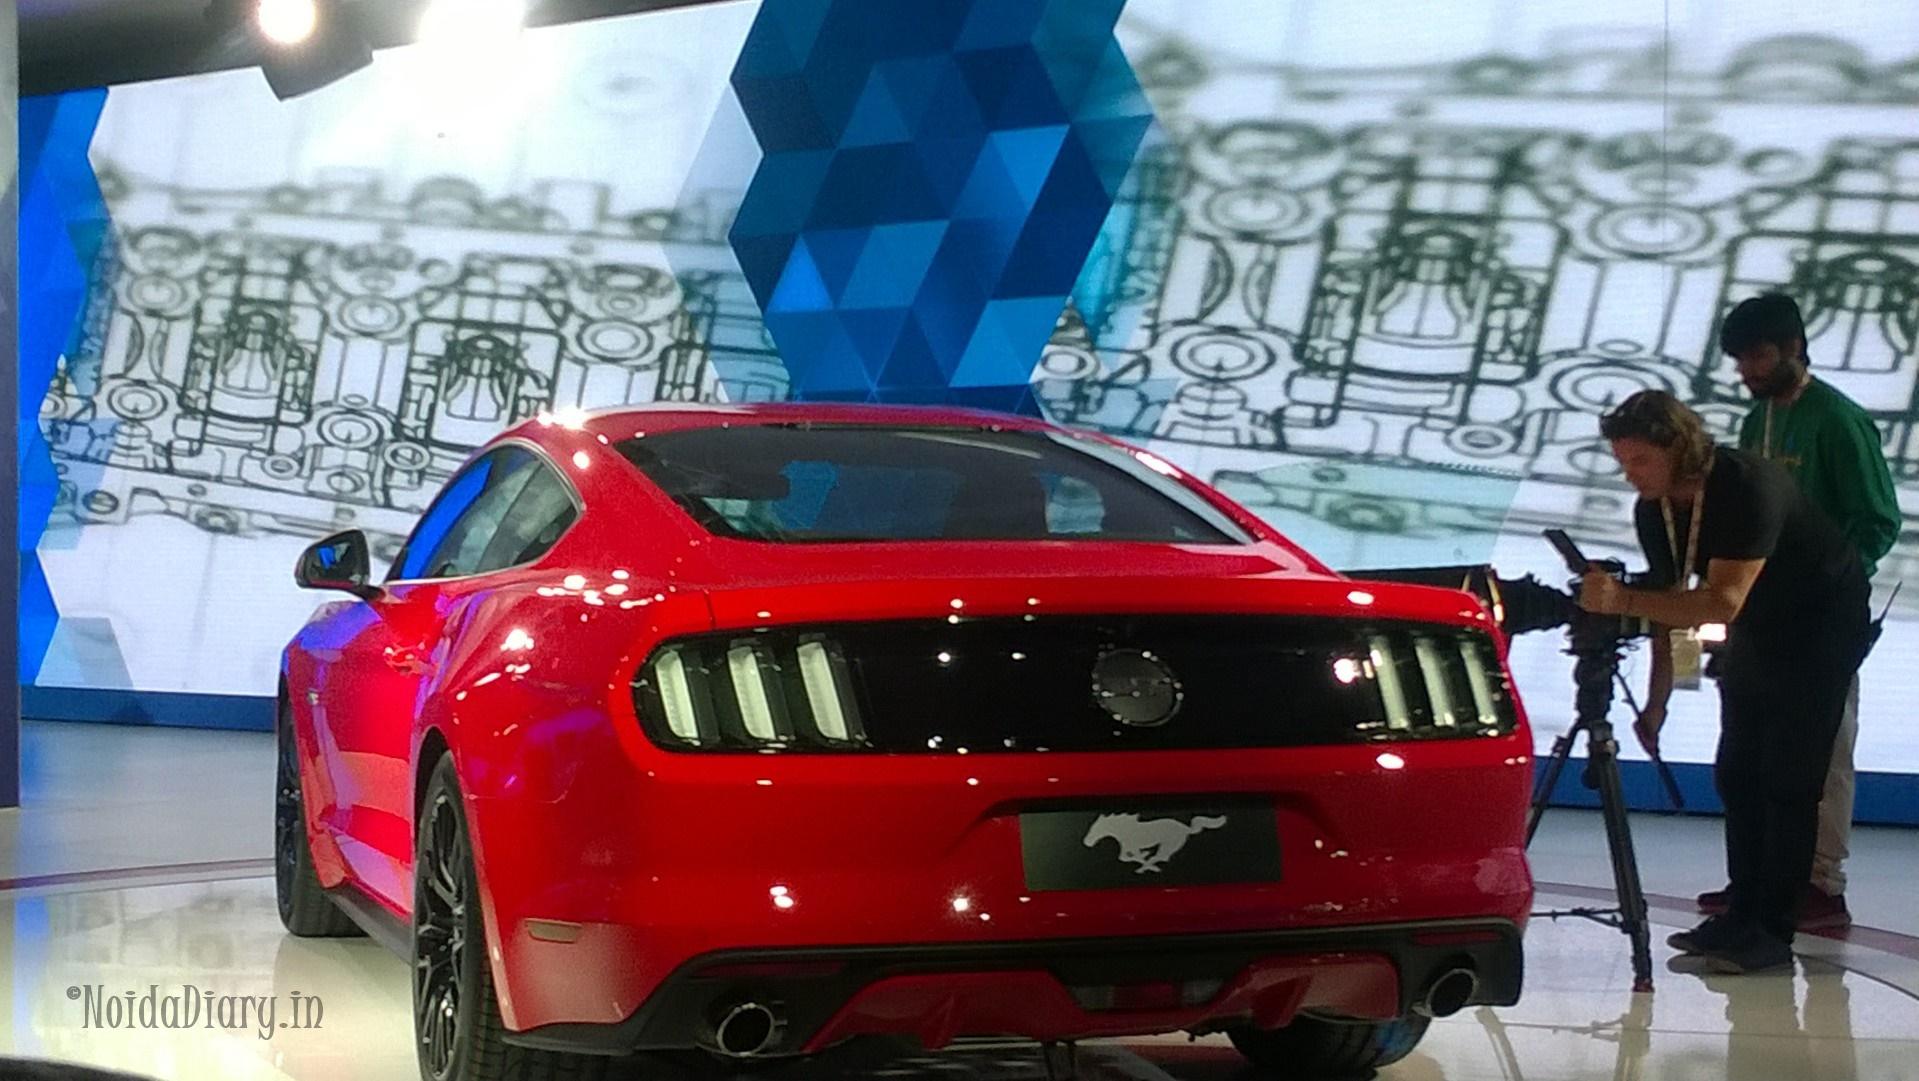 Auto Expo - The Motor Show 2018